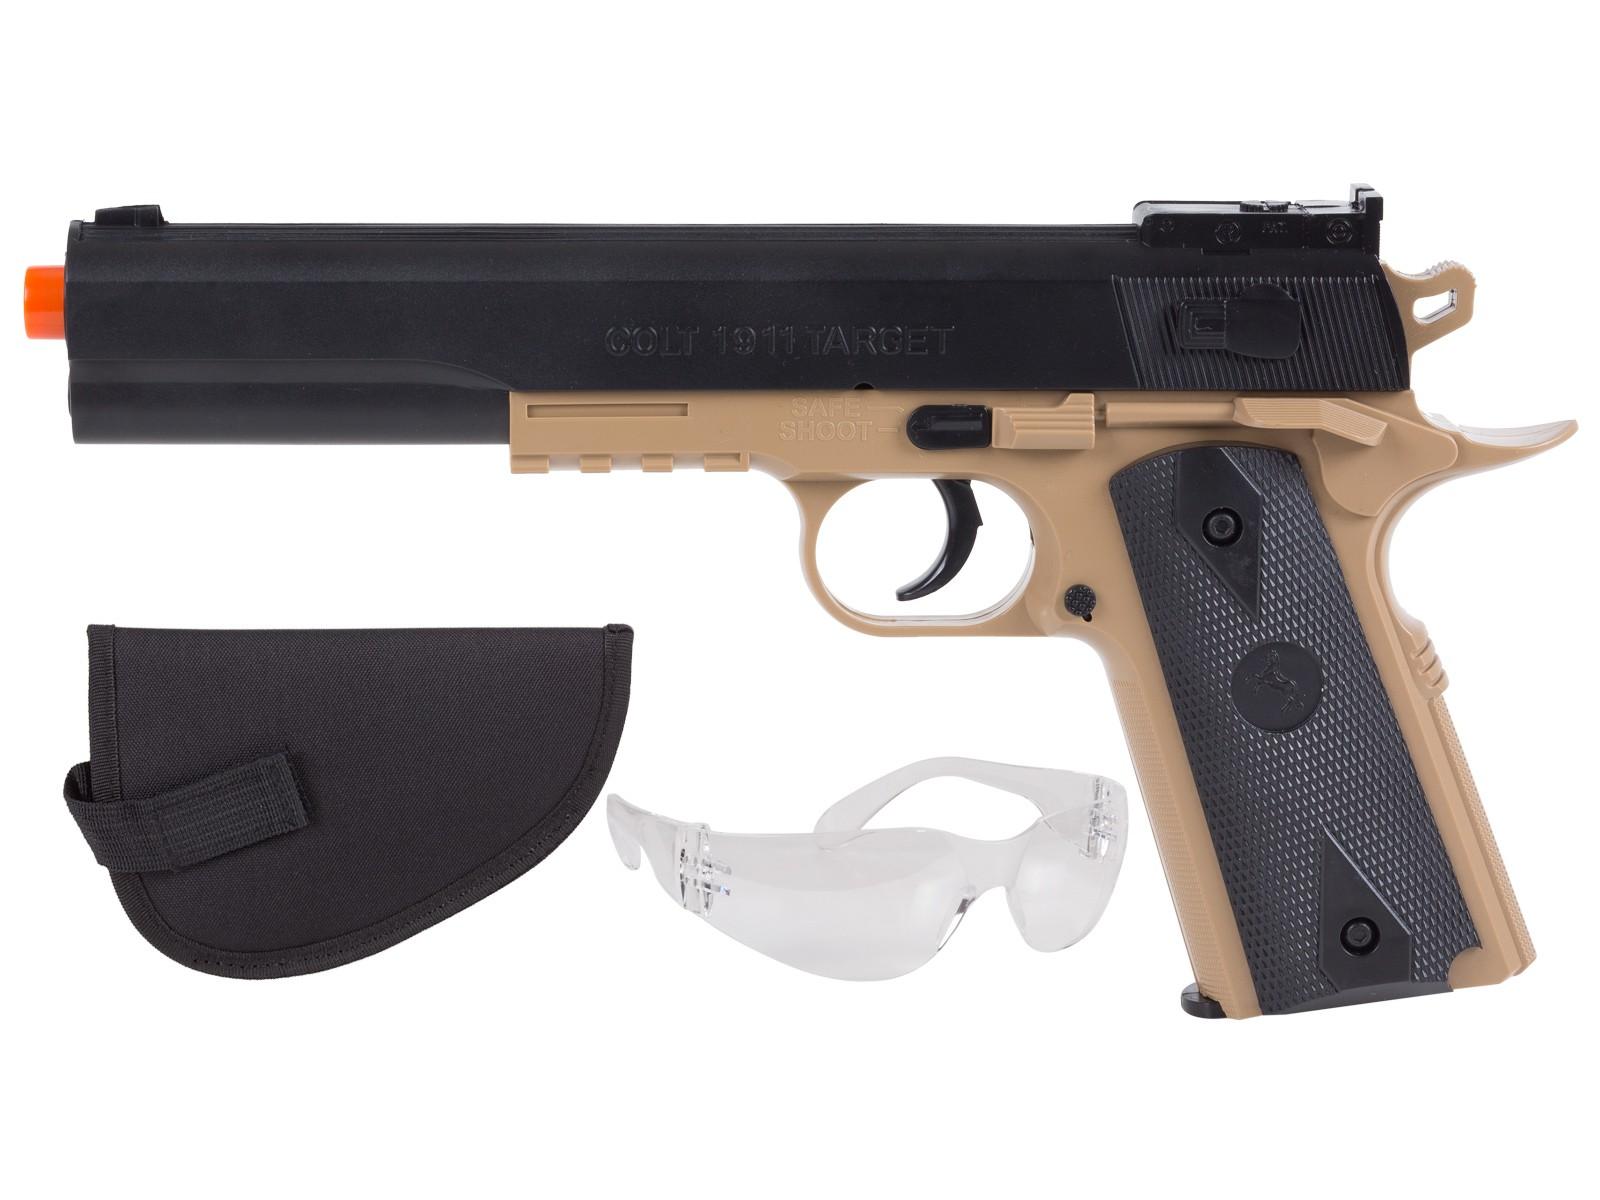 Colt 1911 Spring Airsoft Kit, Black & Tan 6mm